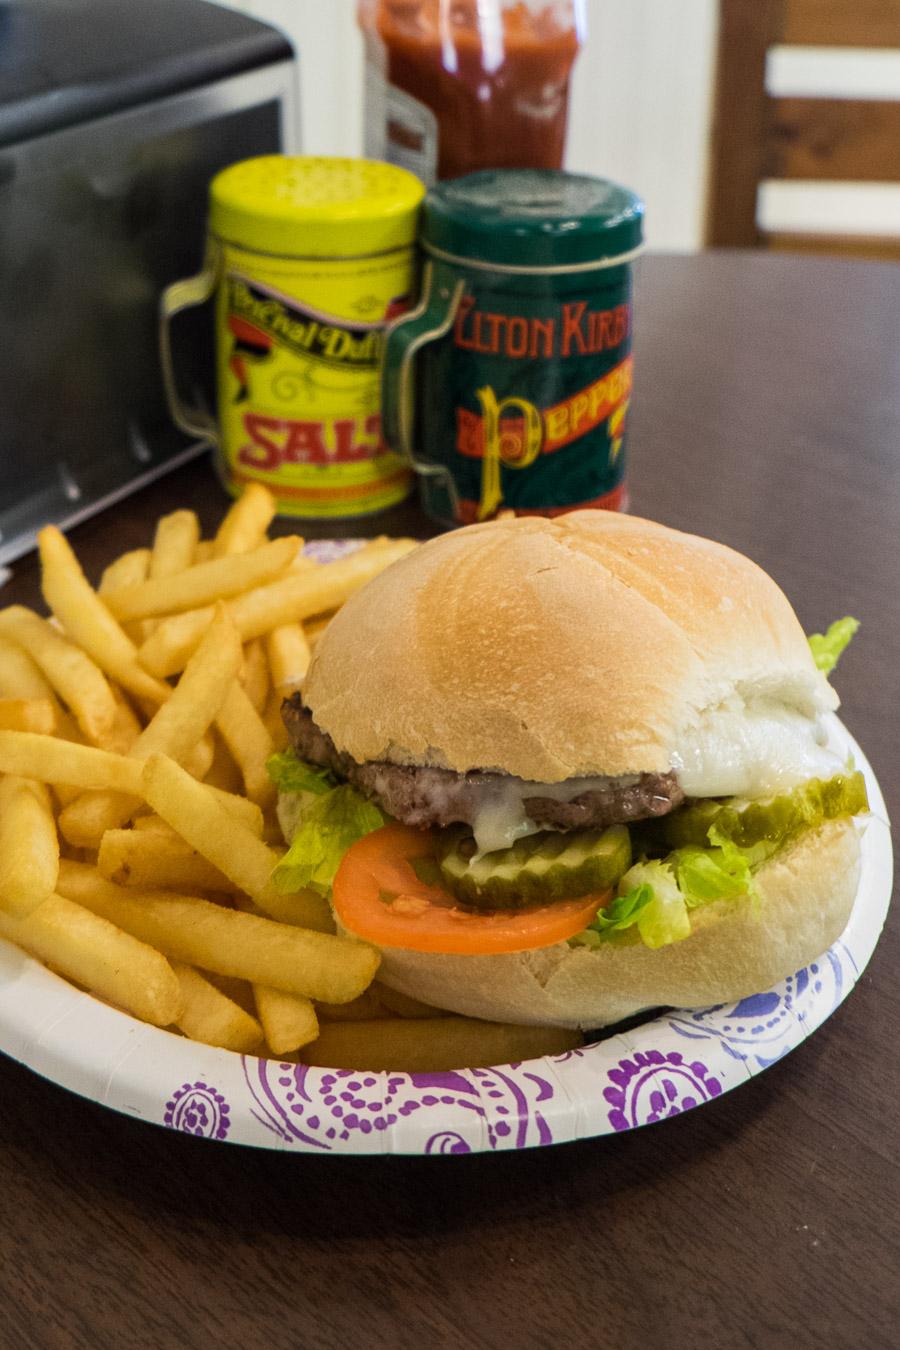 Cheeseburger and fries at Peter's Cafe.